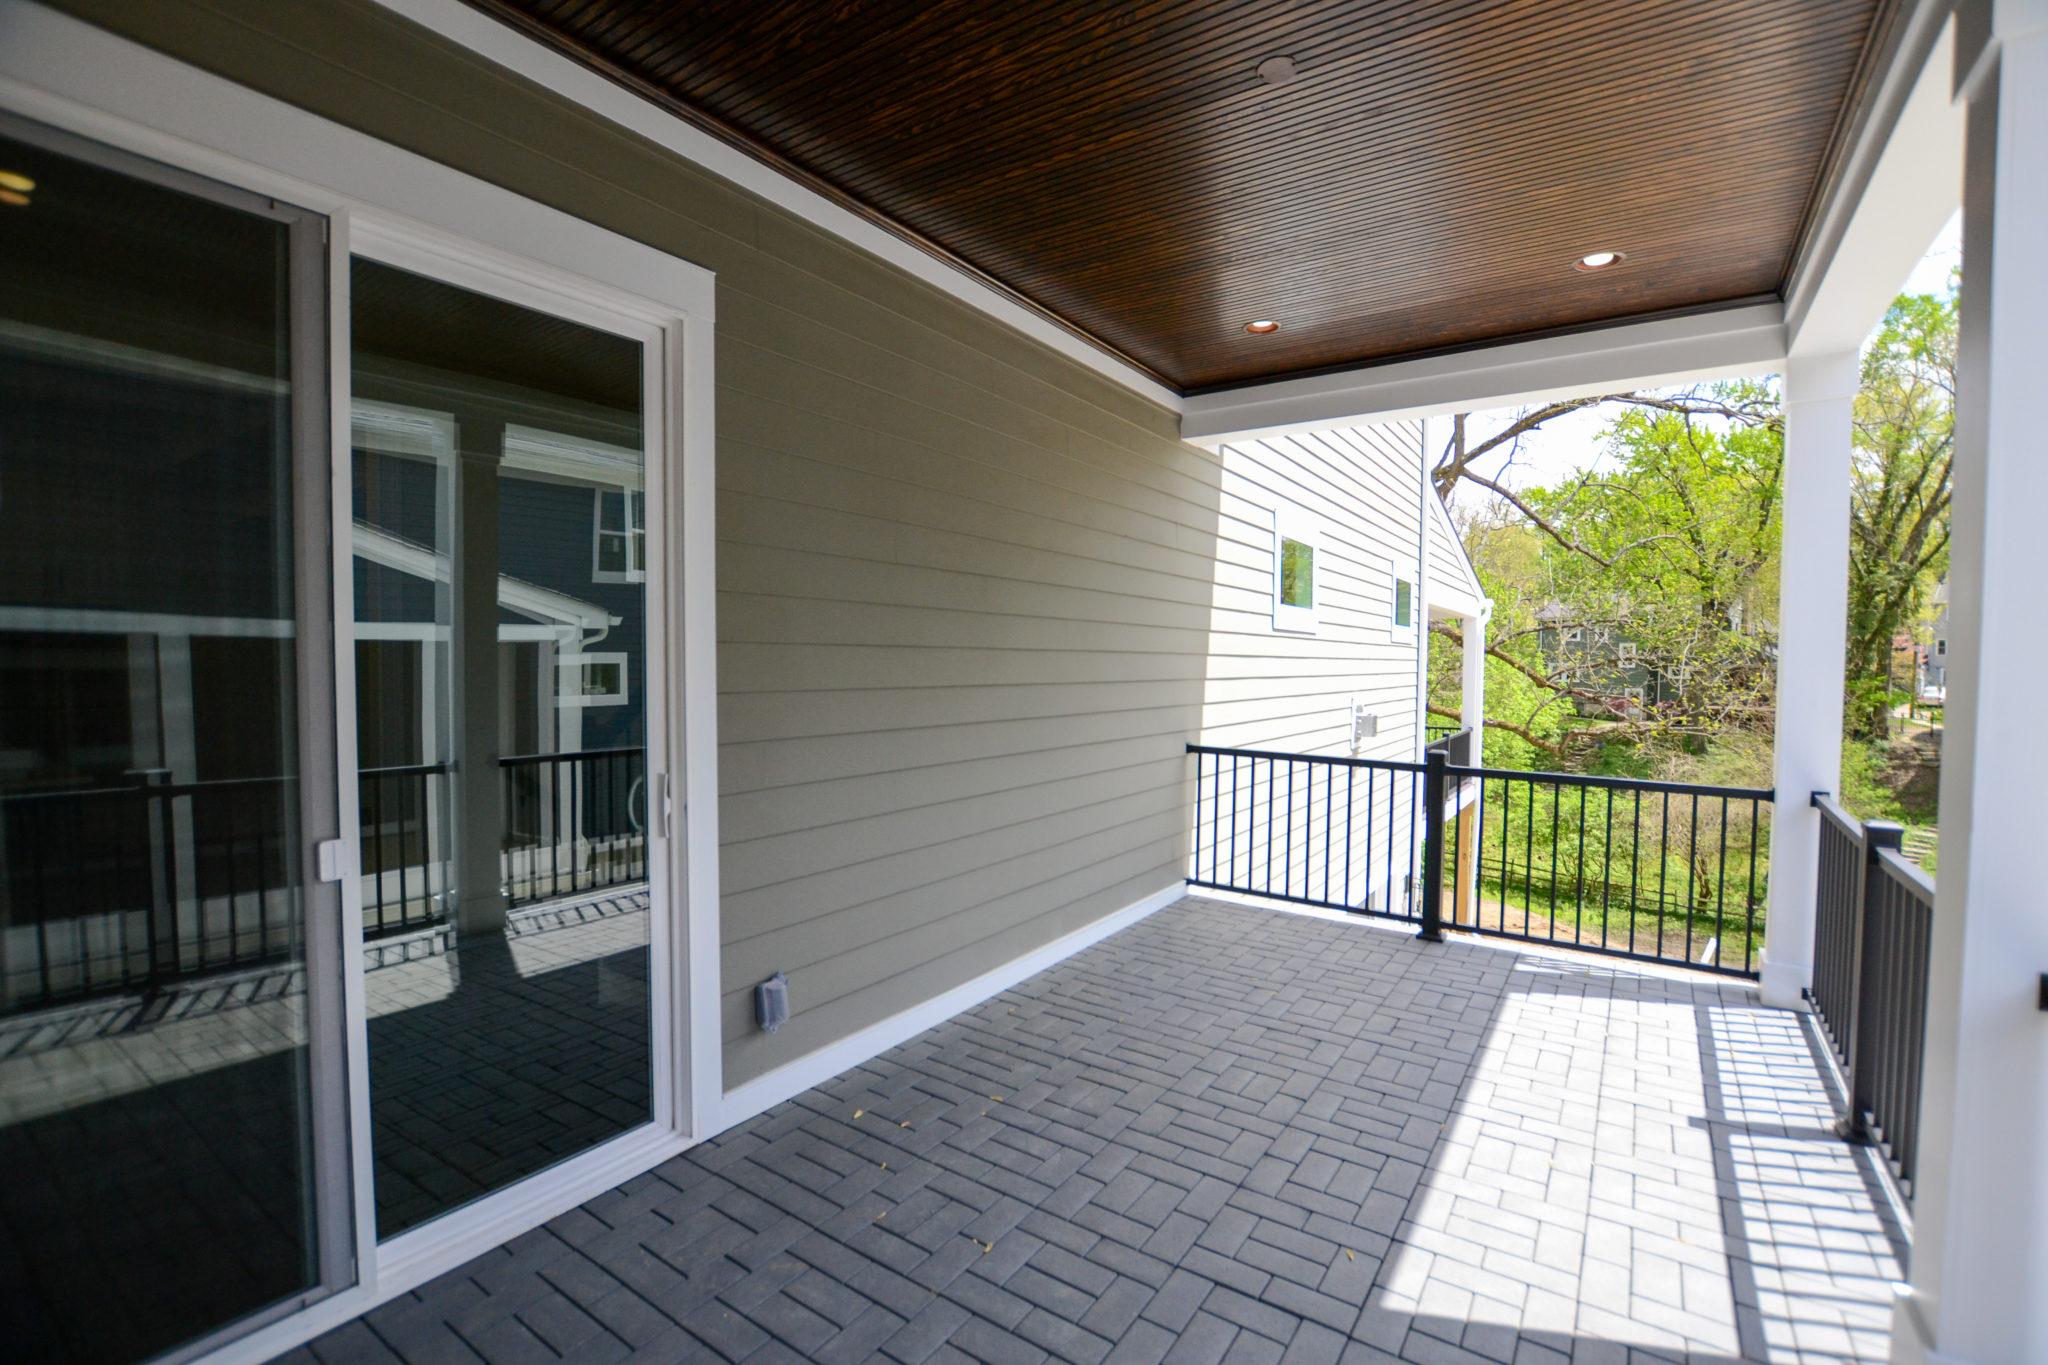 53 Side Porch